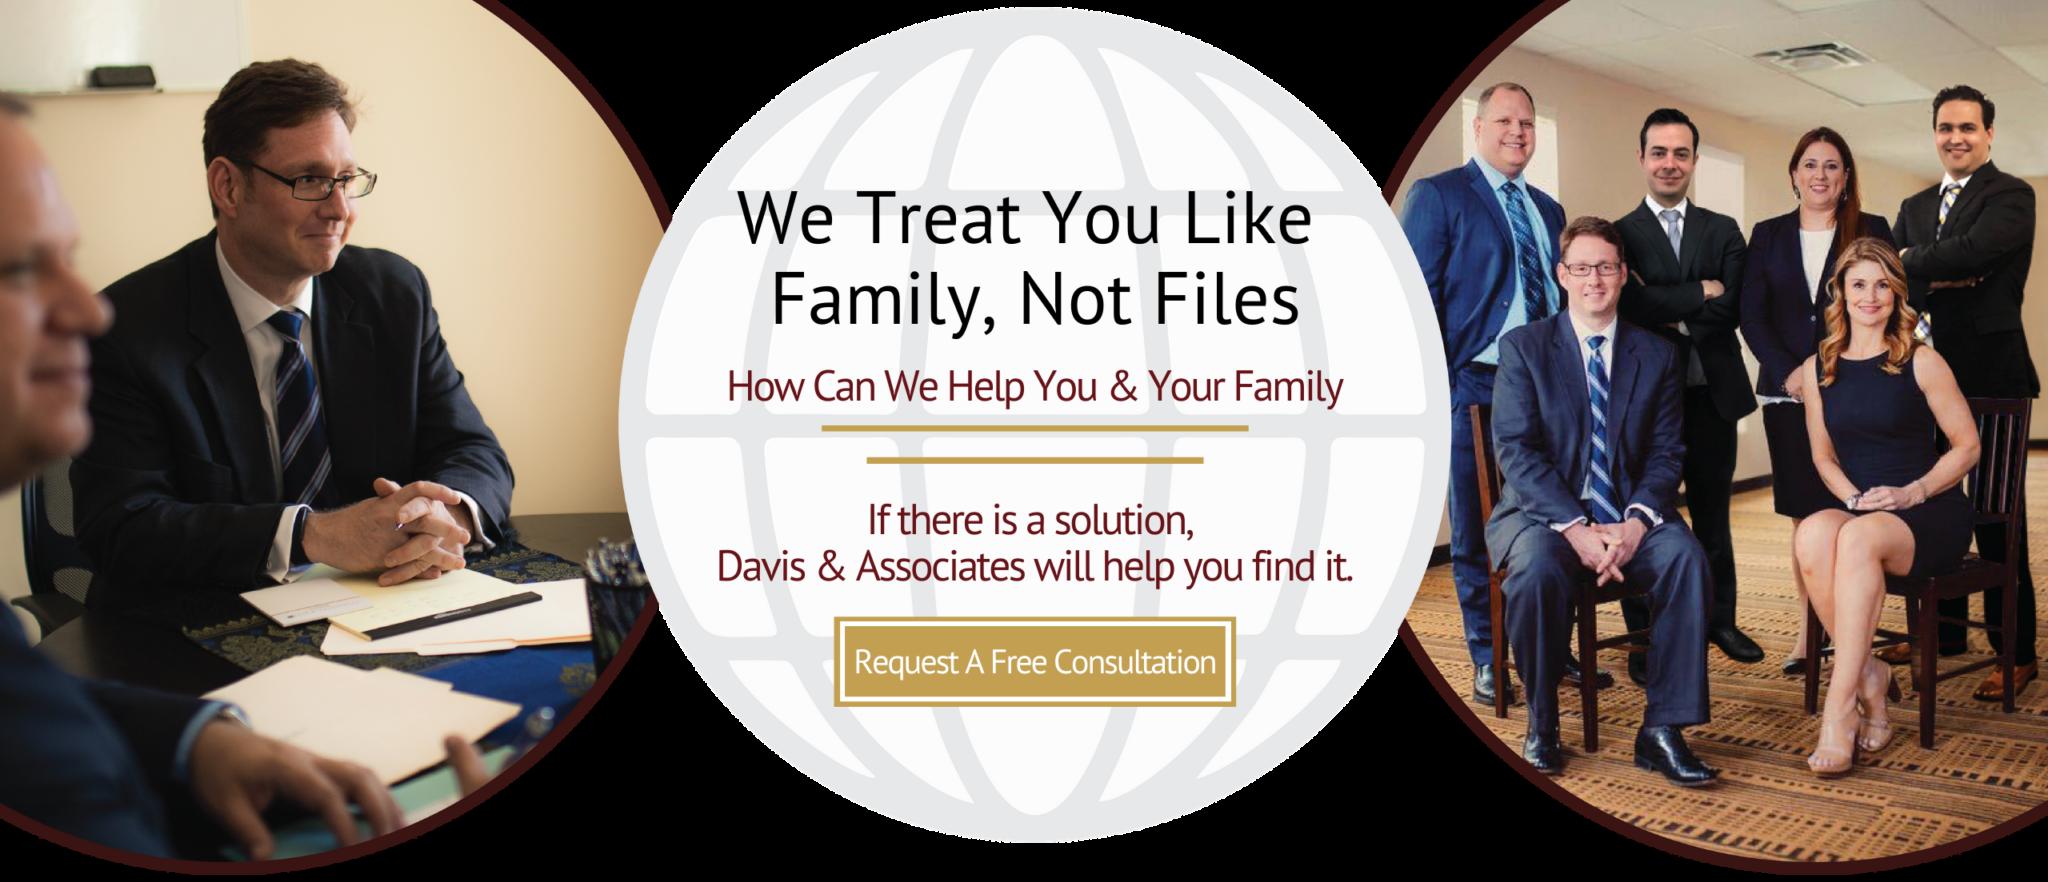 Davis & Associates - Immigration Law Firm in Dallas & Houston TX